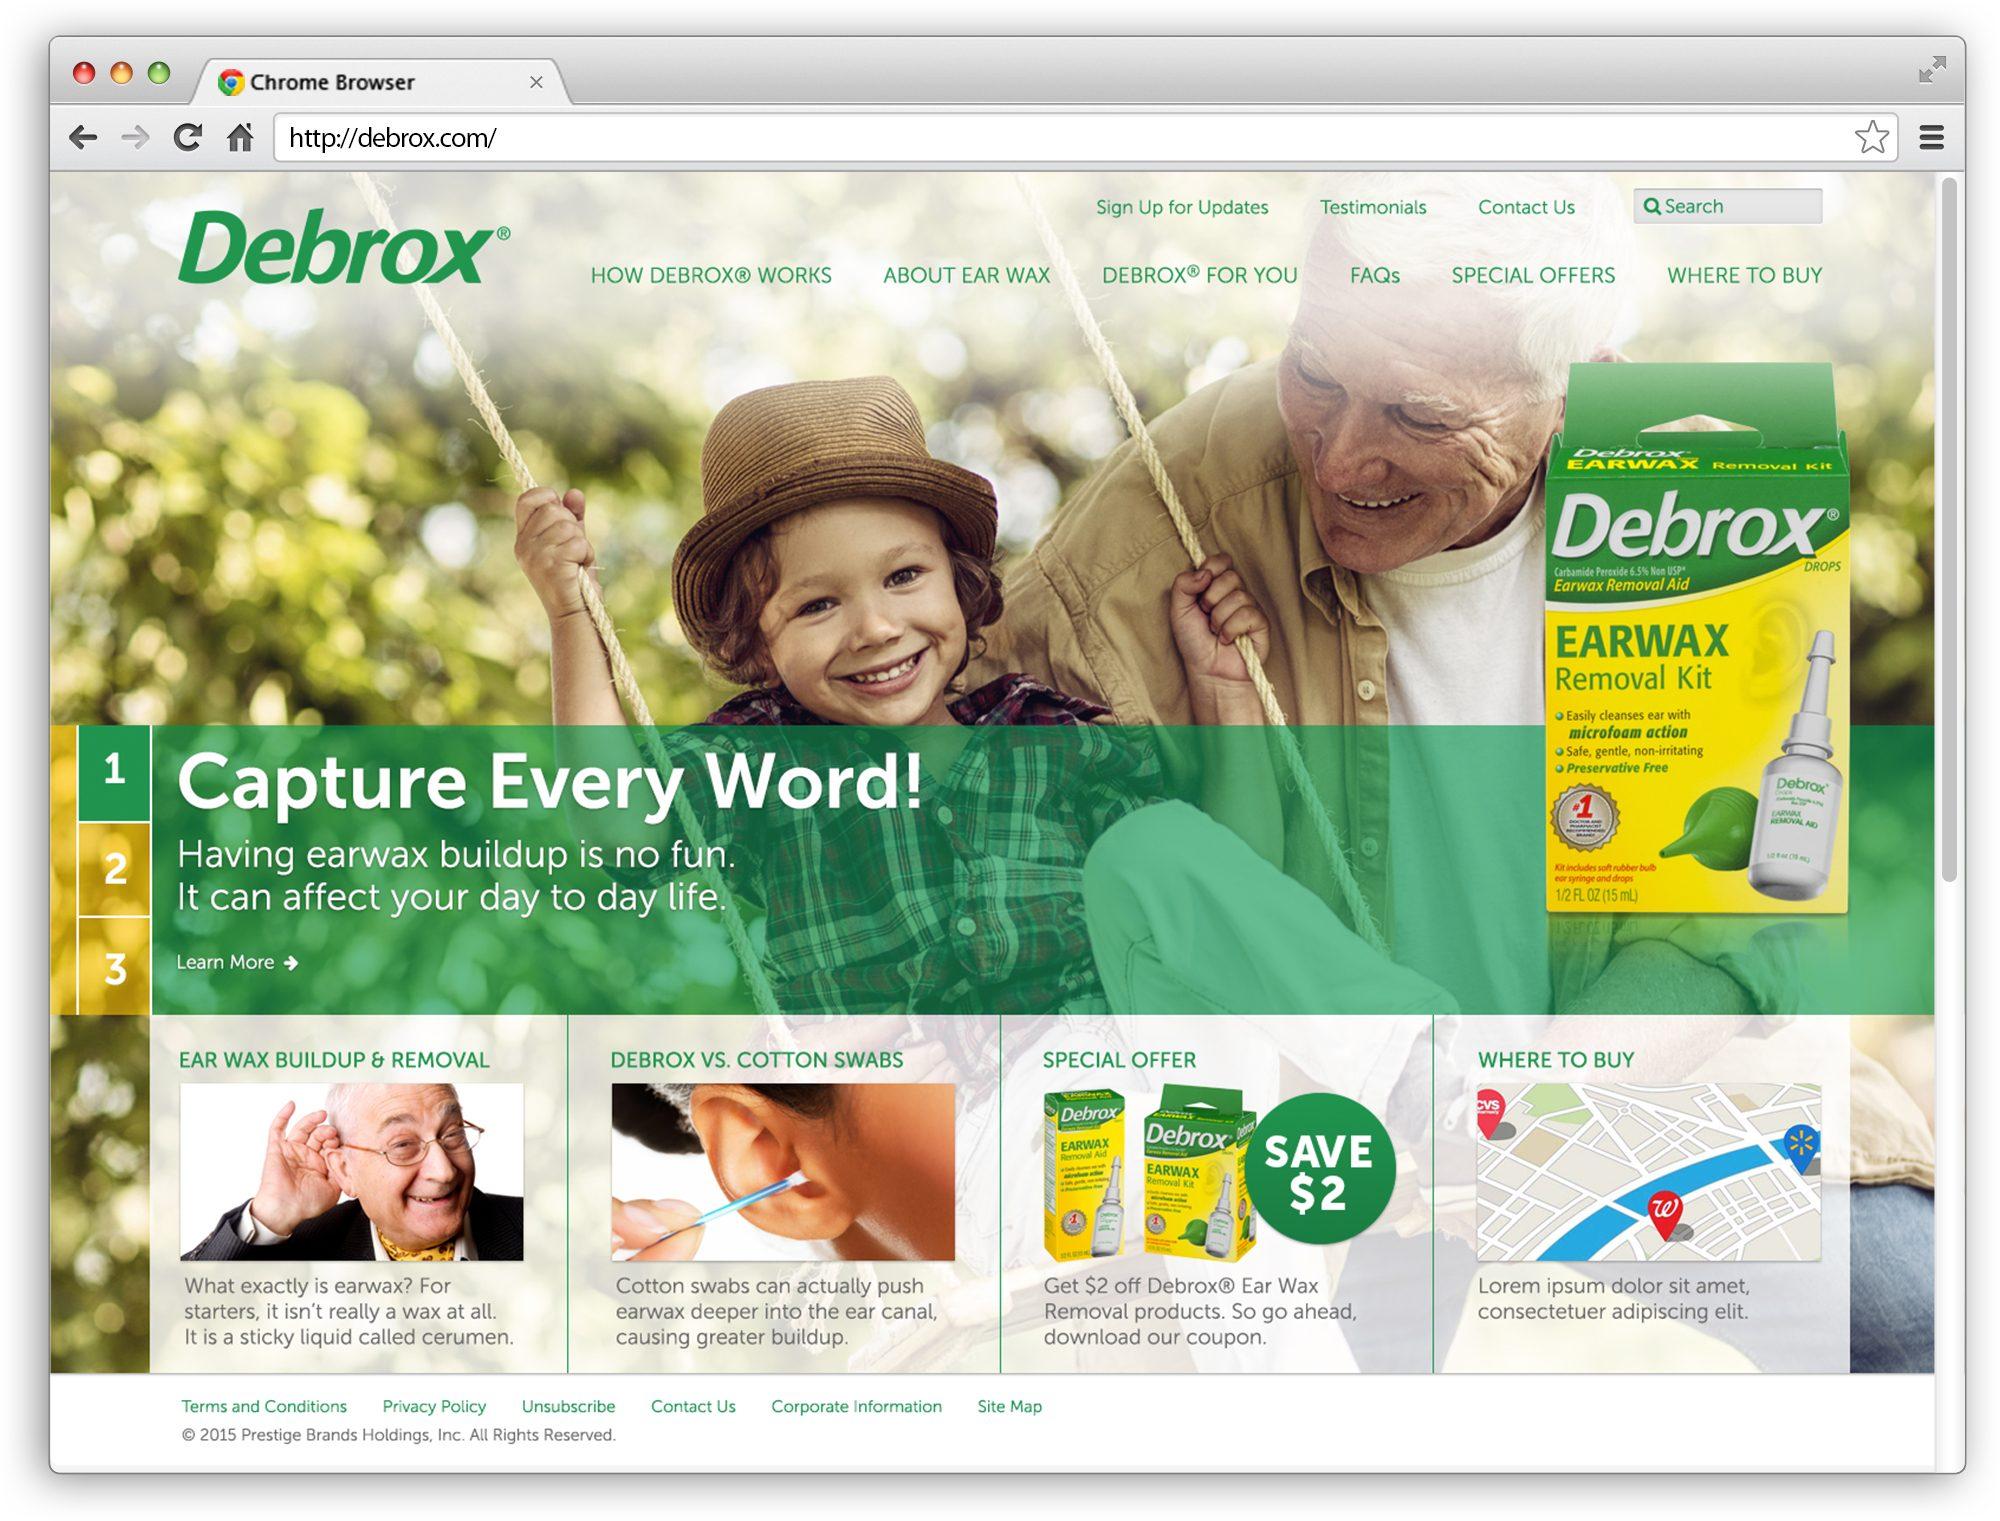 Debrox